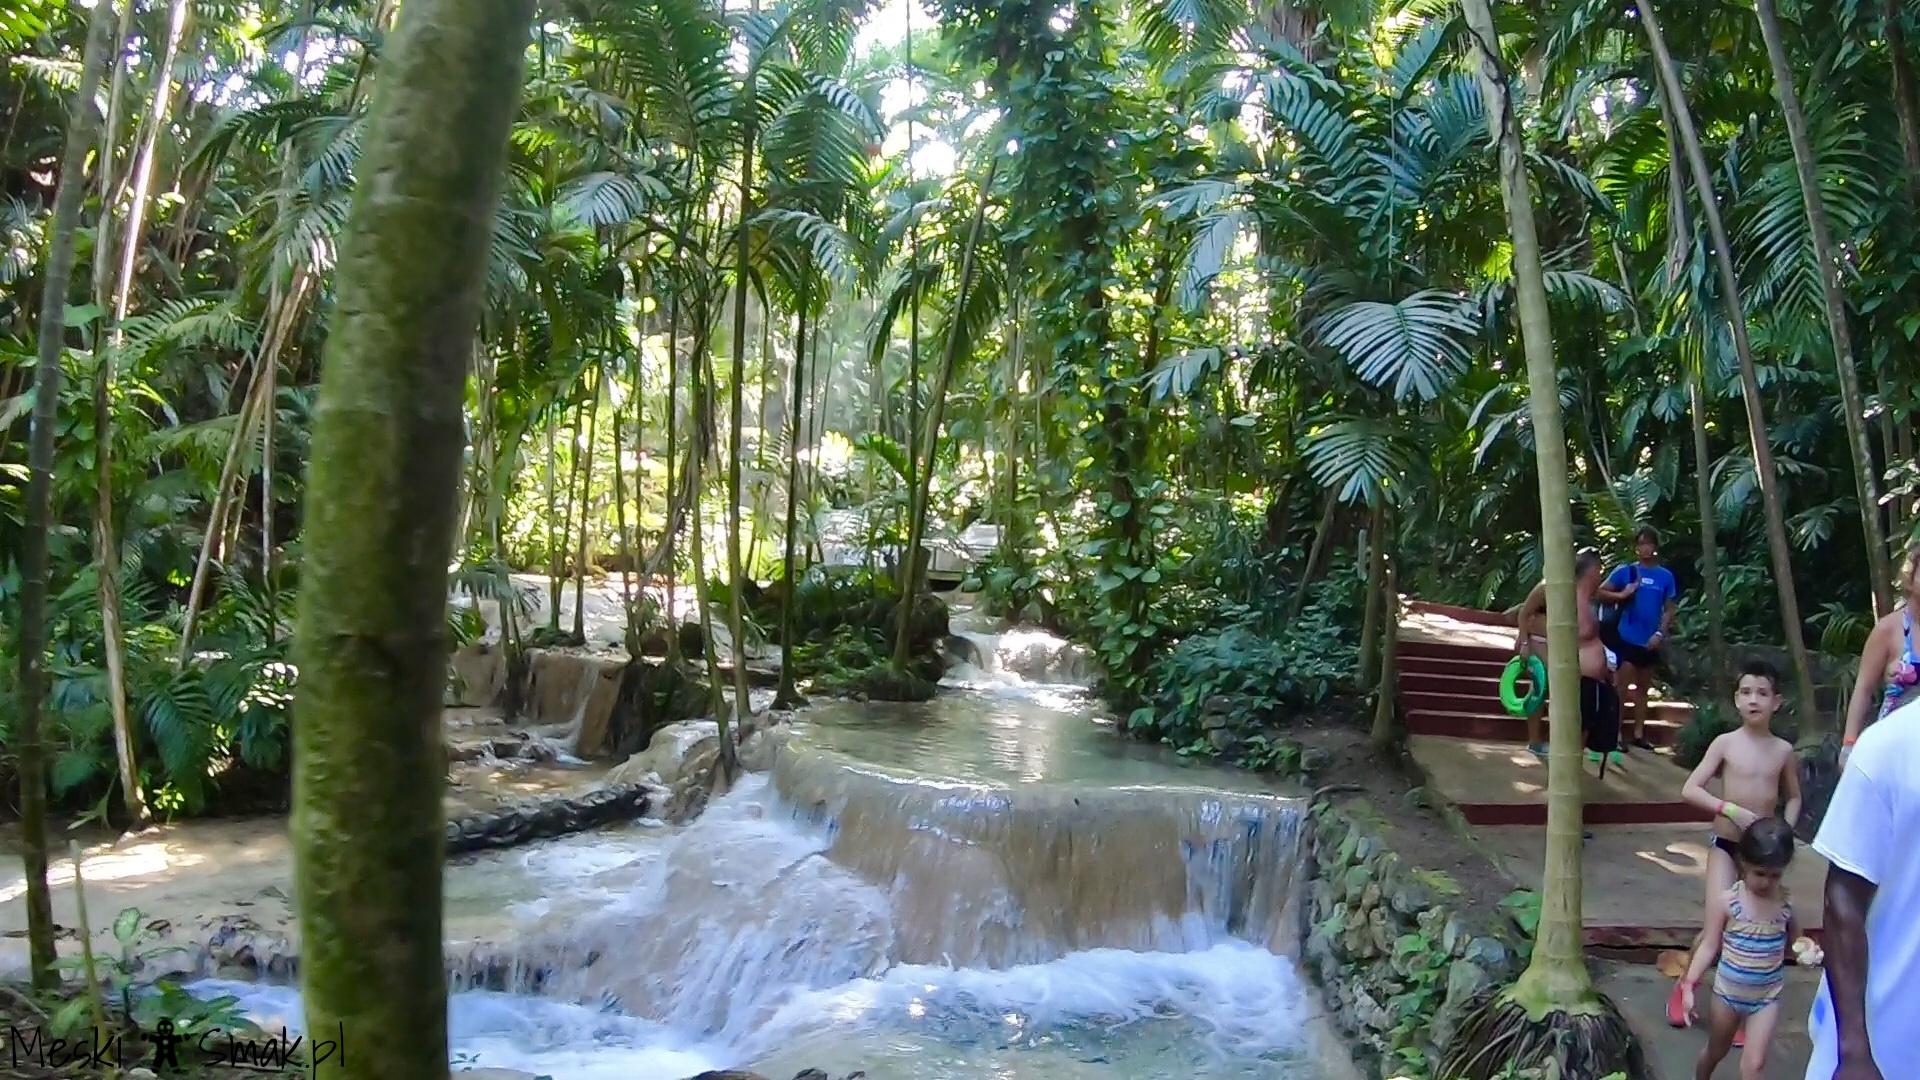 jamajka atrakcje_The Turtle River Falls & Gardens